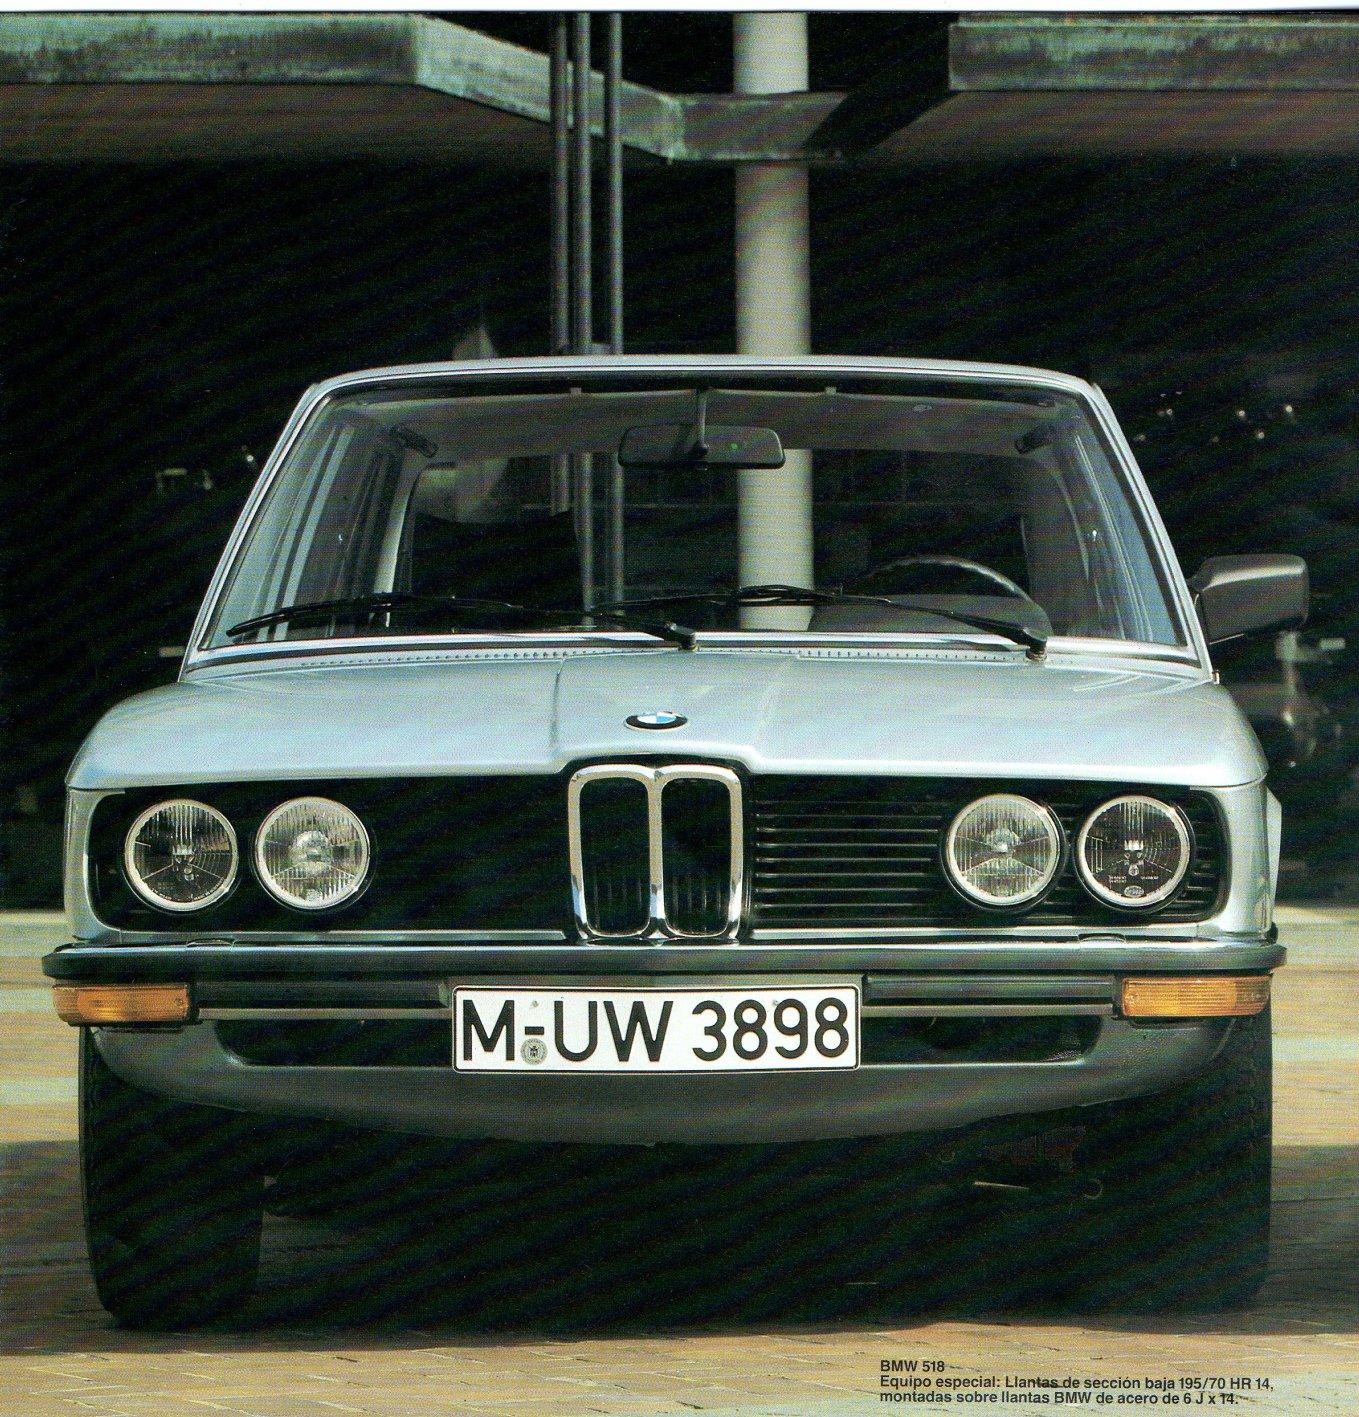 Archivo De Autos La Serie 500 Bmw Light Sensorldr Ofalightsensorcircuitwhenthelight Symbol3sir 518 Modelo 1980 Con Llantas Seccin Baja 195 70 Hr 14 Acero 6j X Como Opcionales